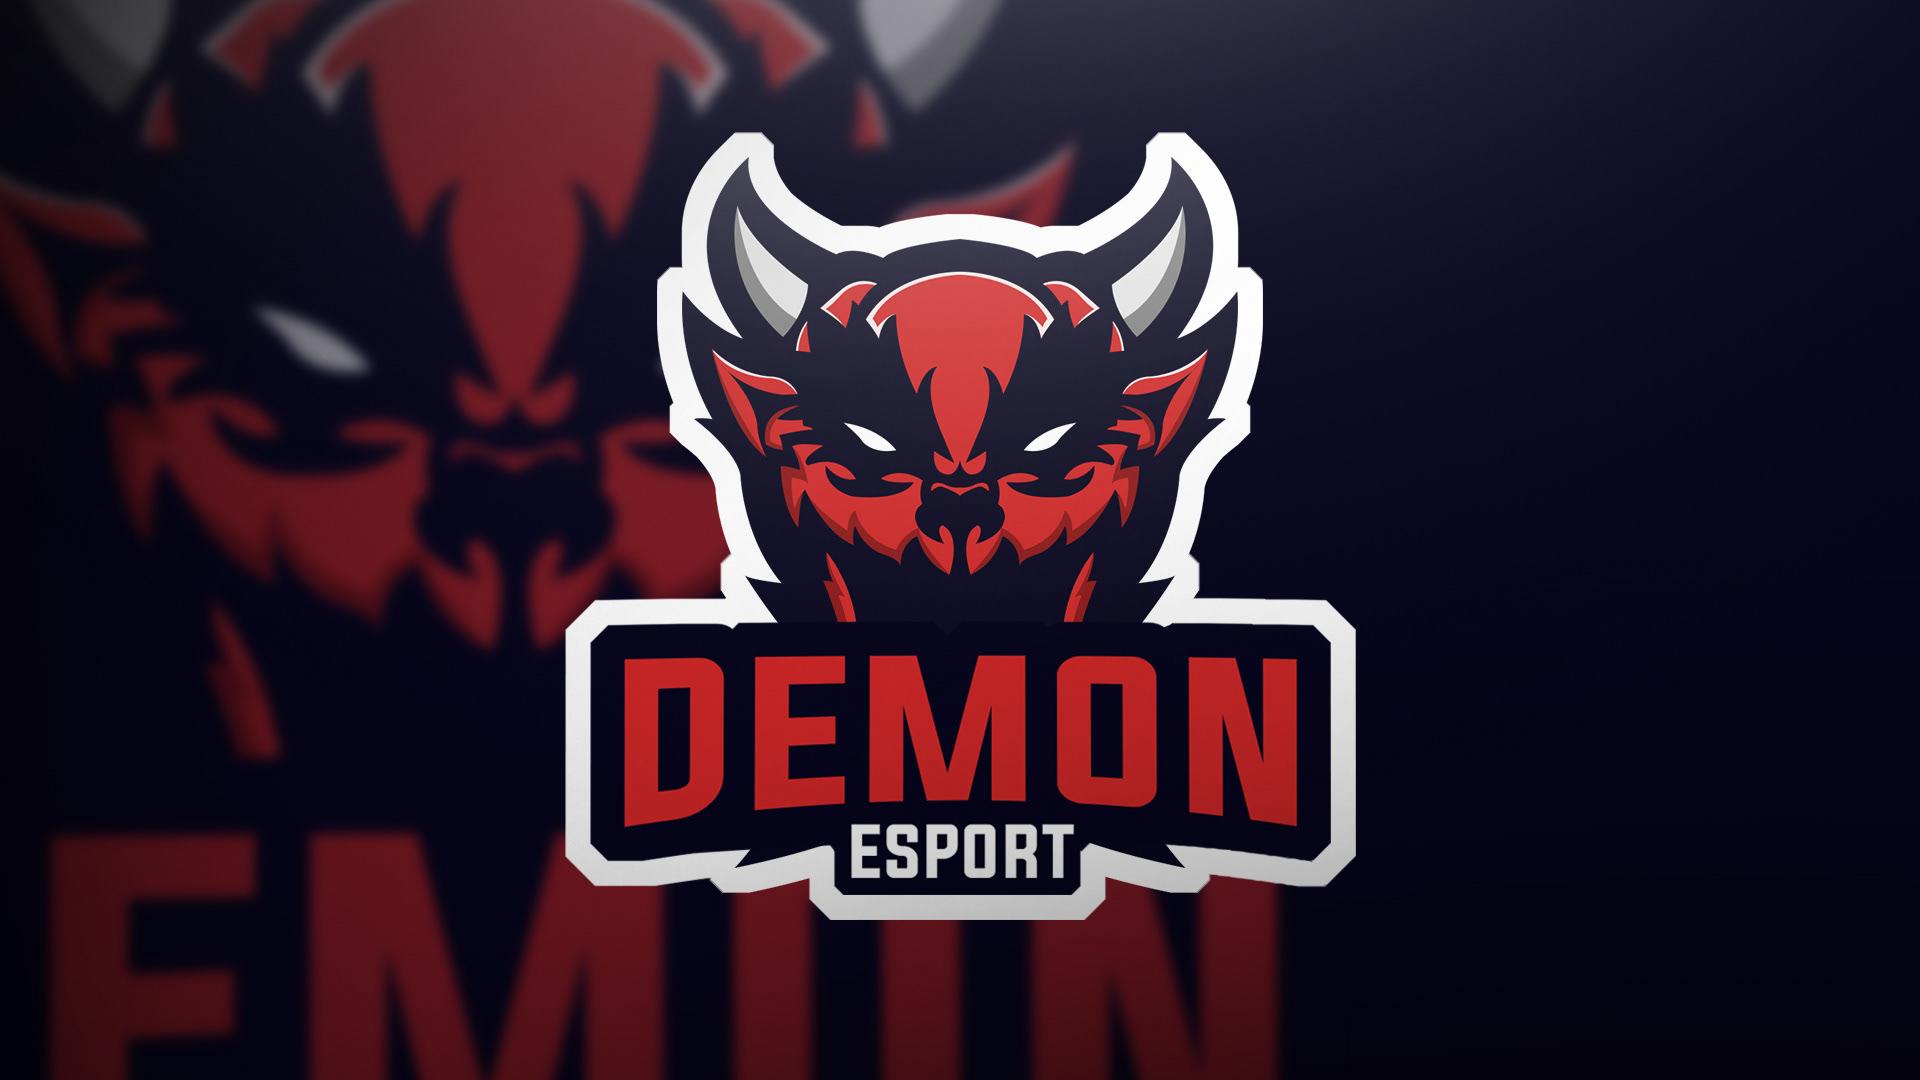 Edward Johansson Demon Mascot Logo